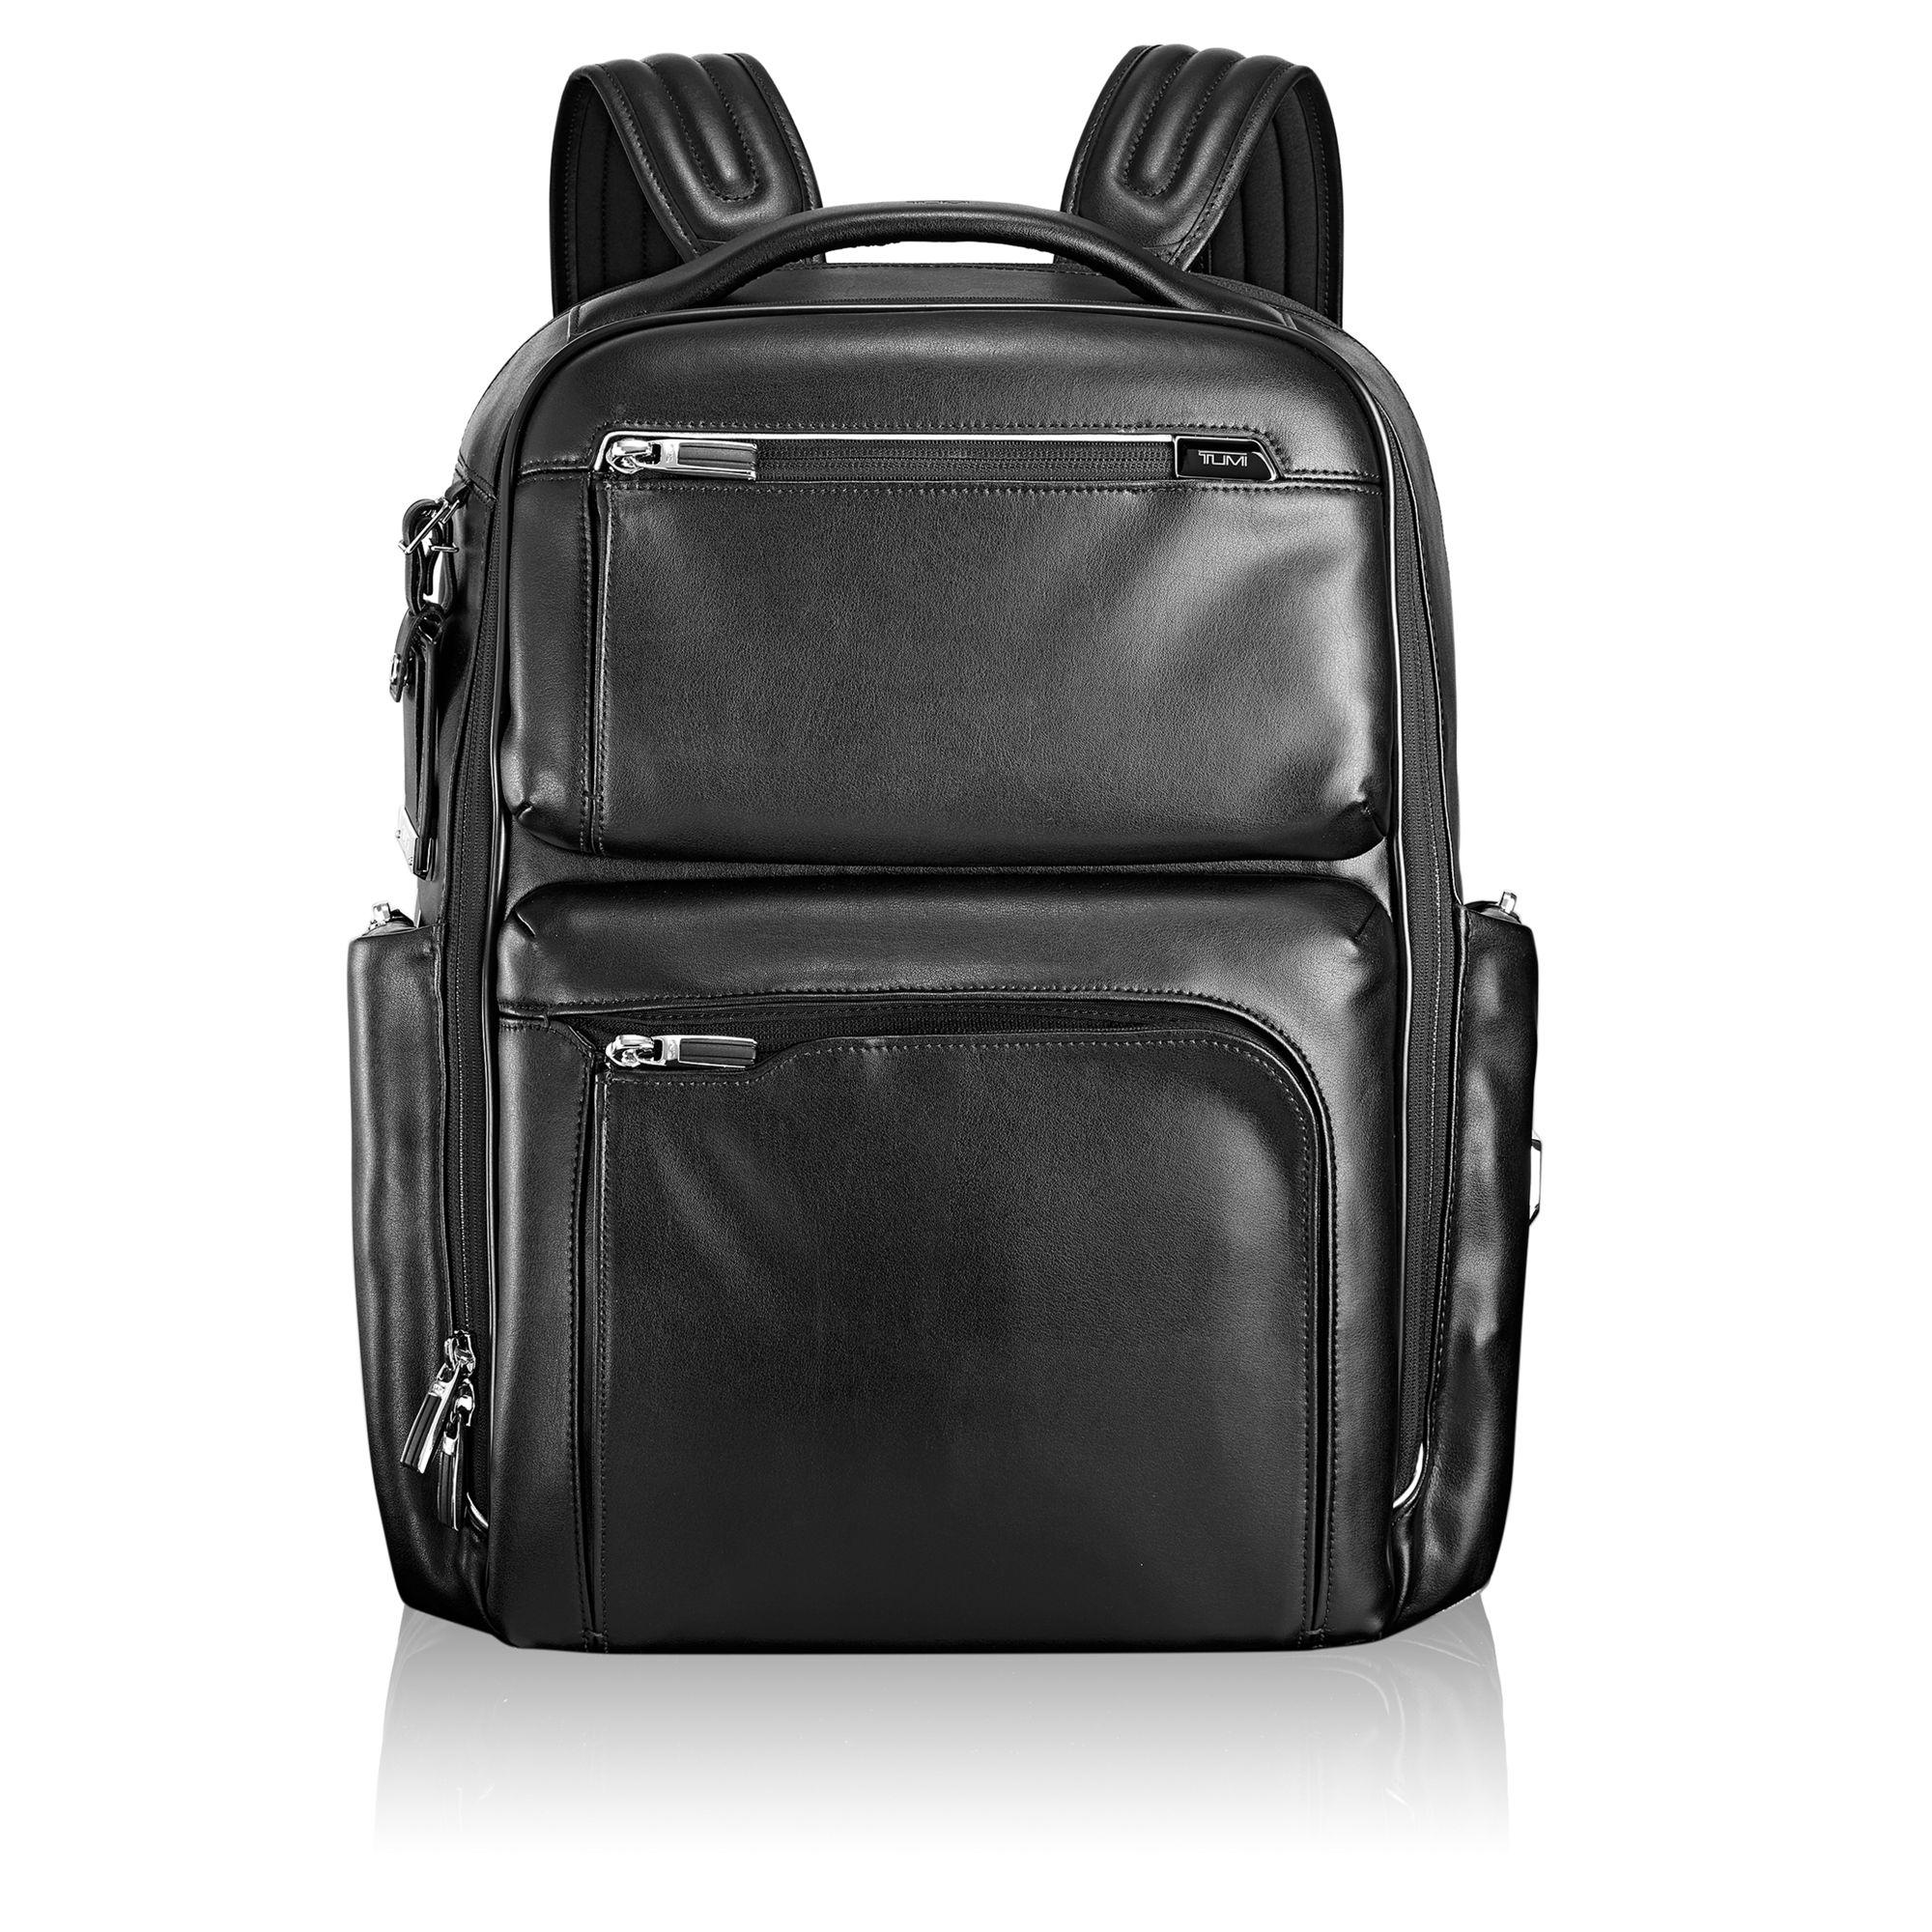 Bradley Leather Backpack - Arrivé   Tumi US